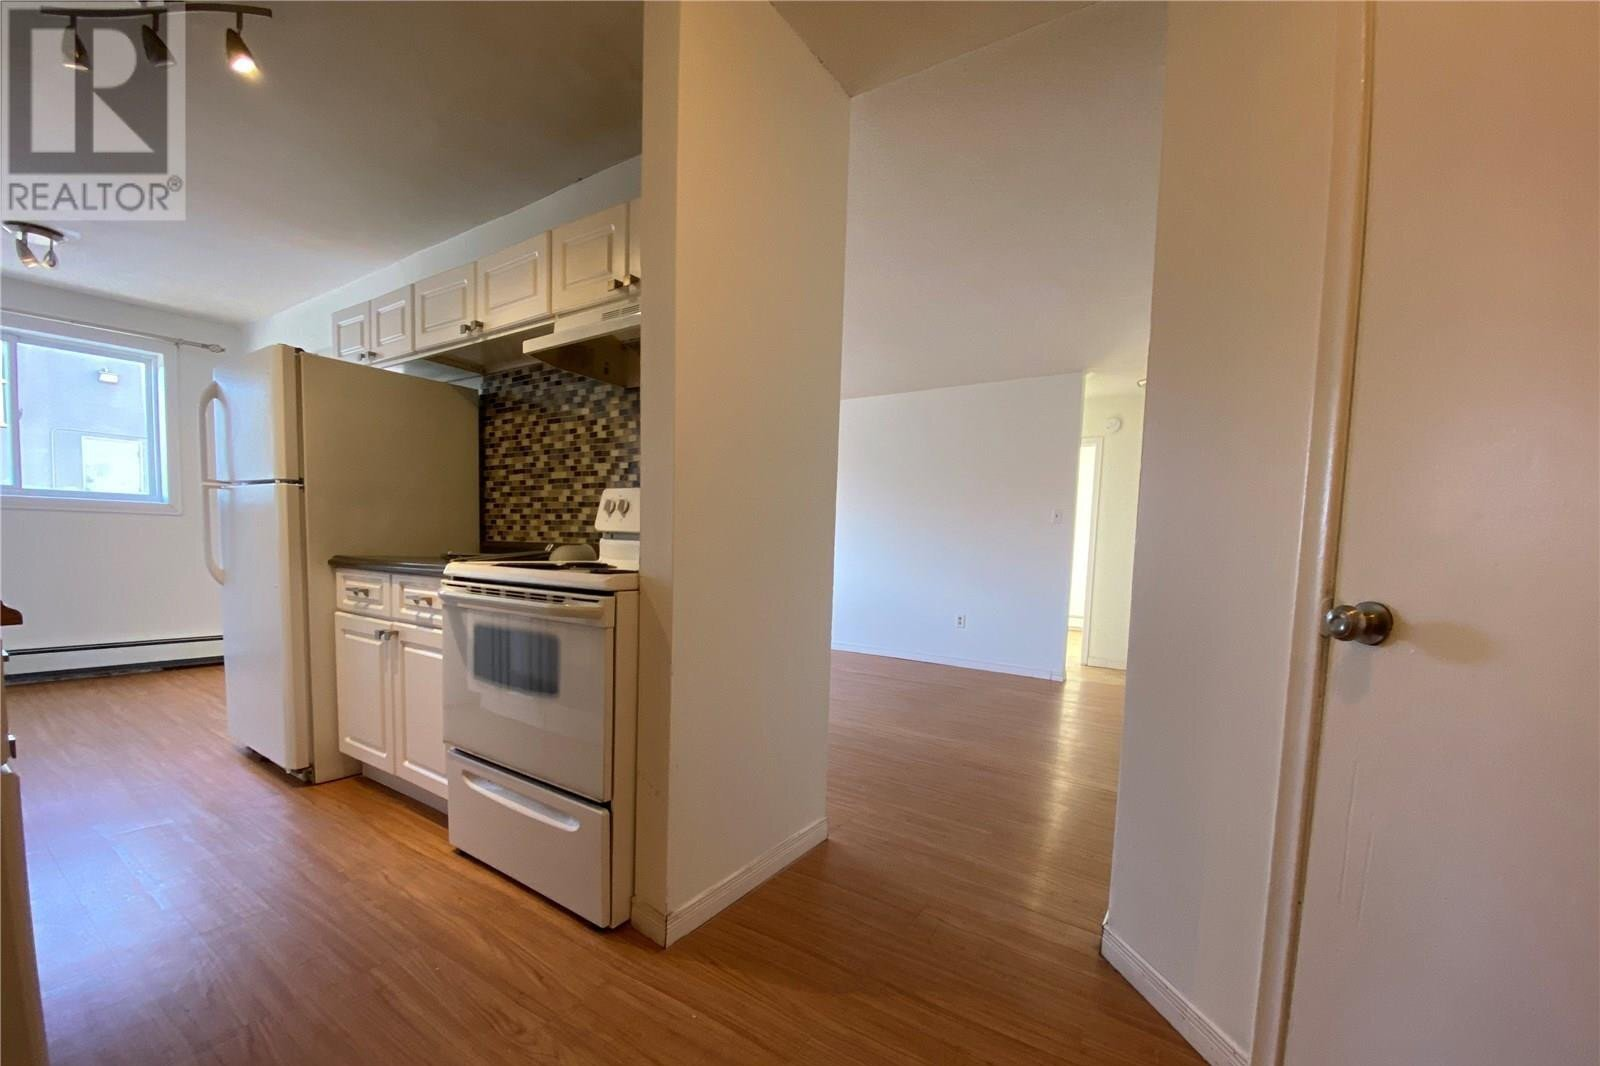 House for sale at 365 Angus St Unit 6 Regina Saskatchewan - MLS: SK834846